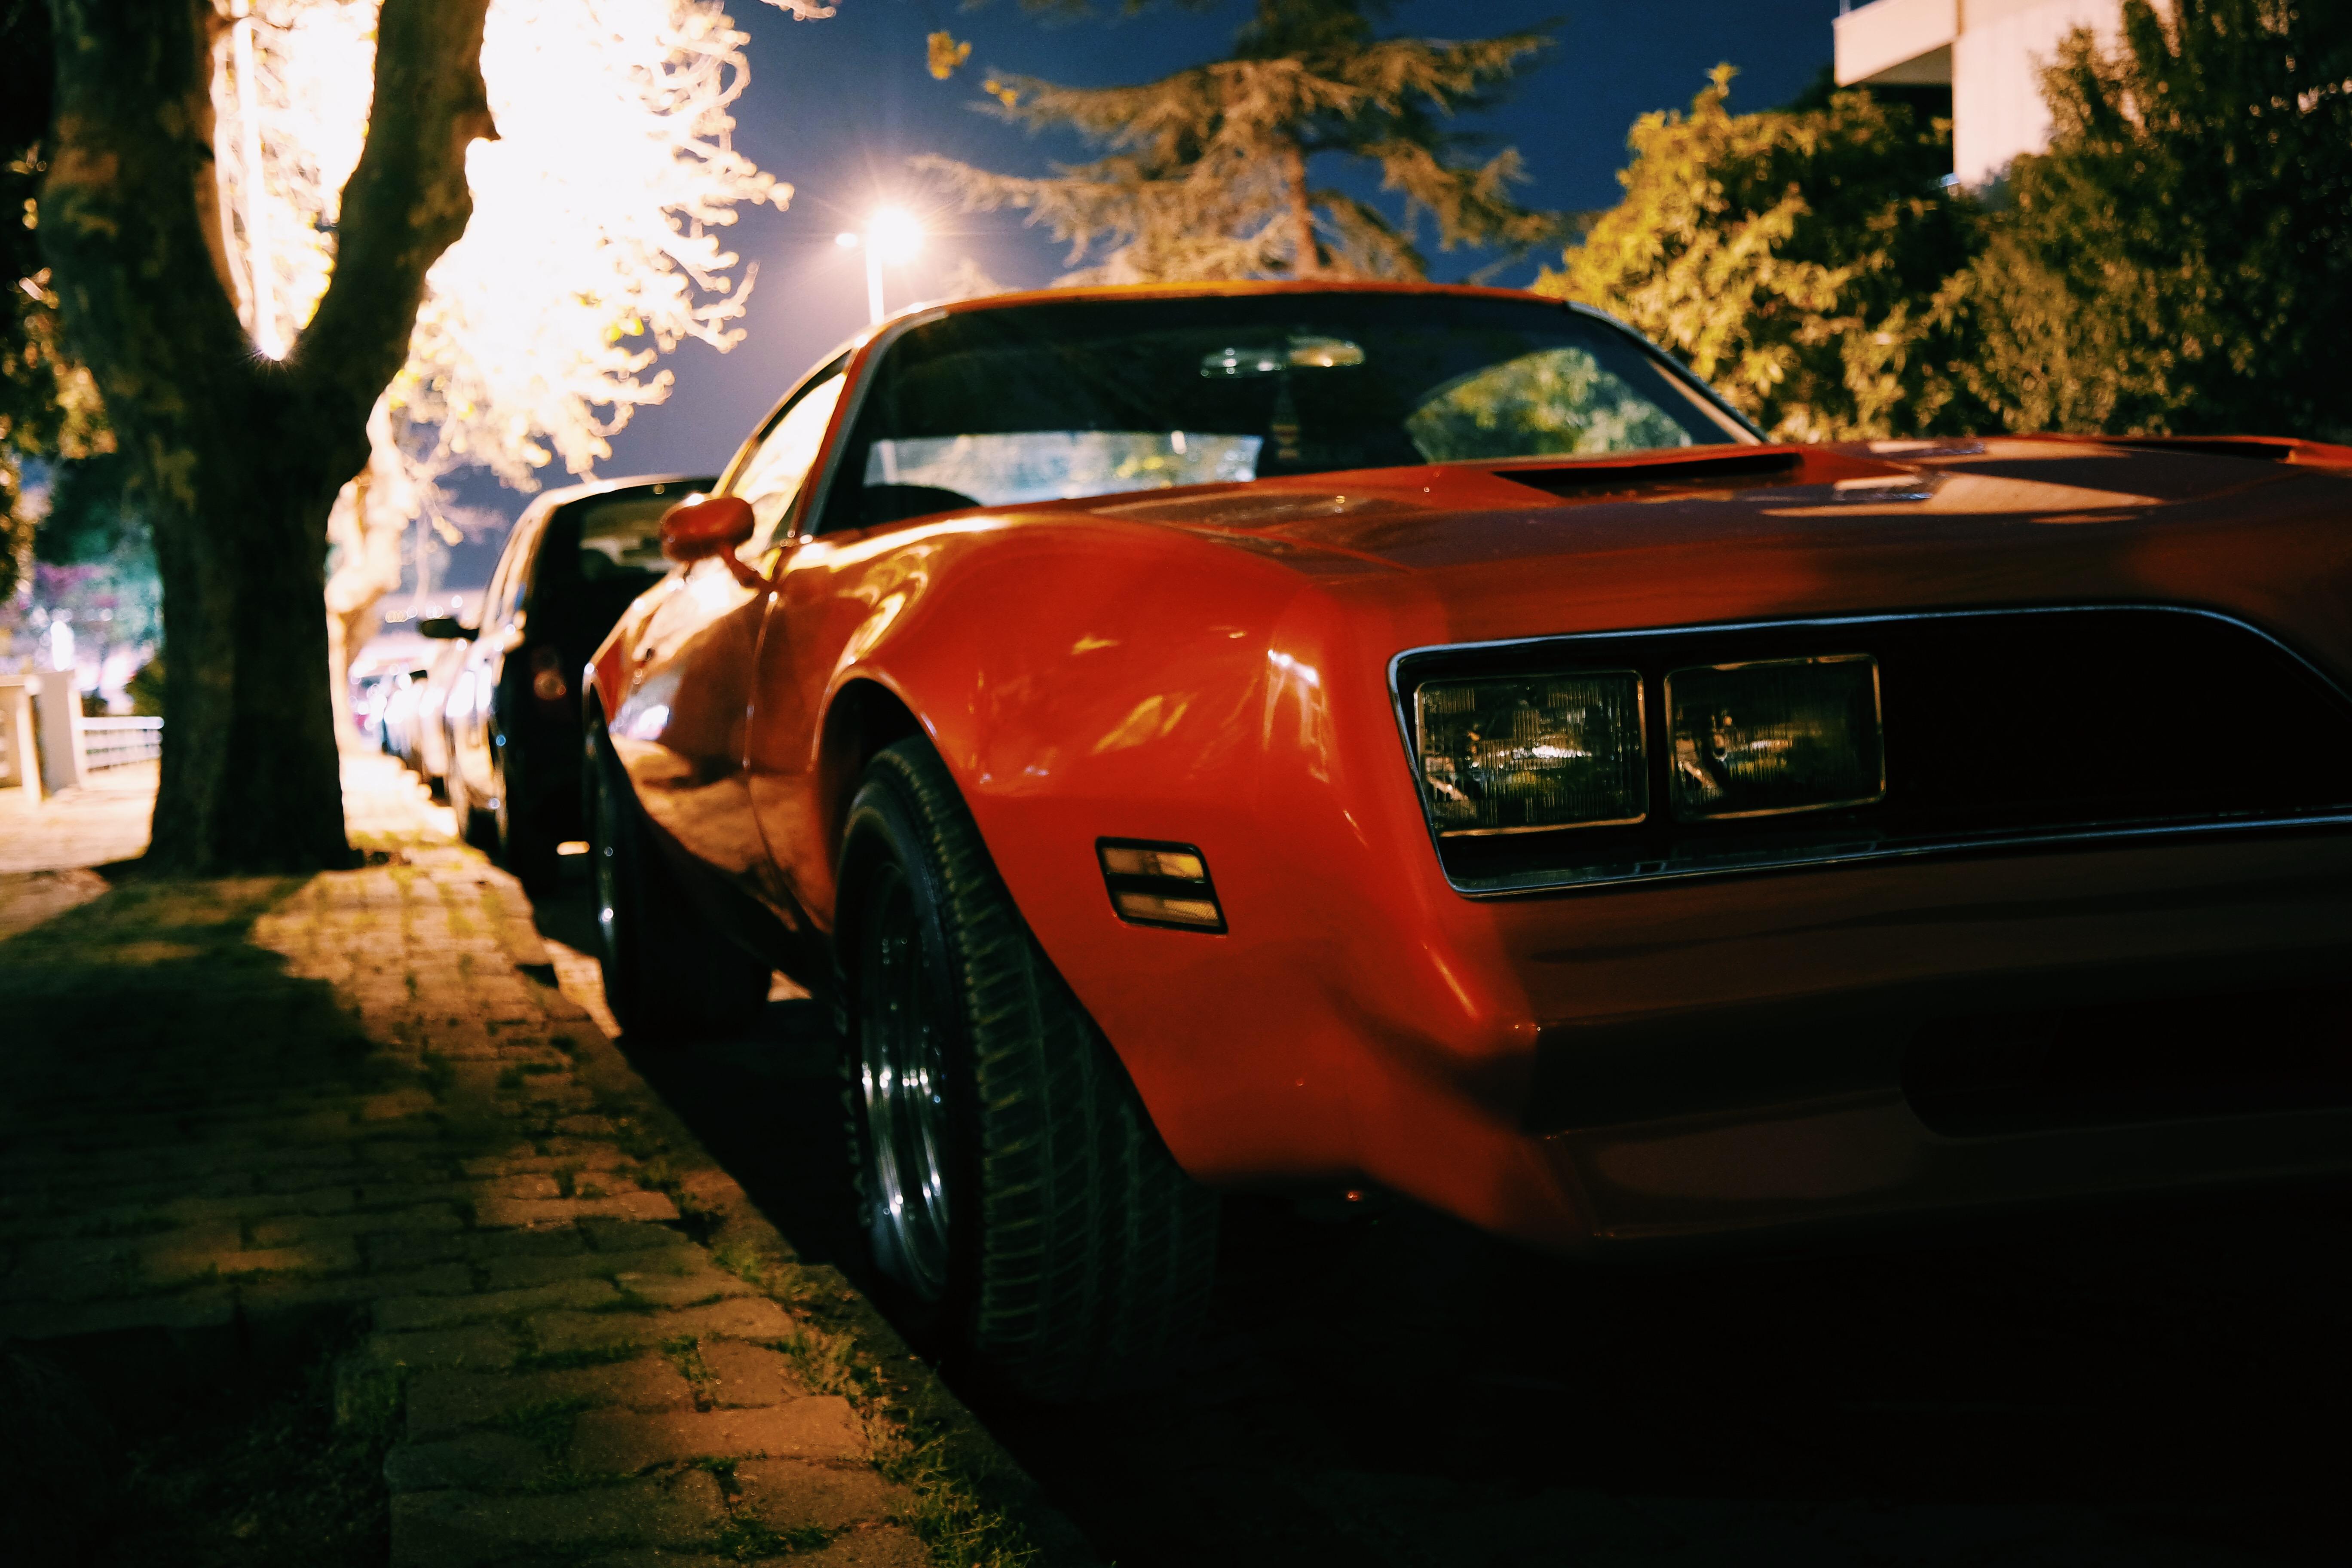 Free Images Sidewalk Sports Car Vintage Car Muscle Car Parked